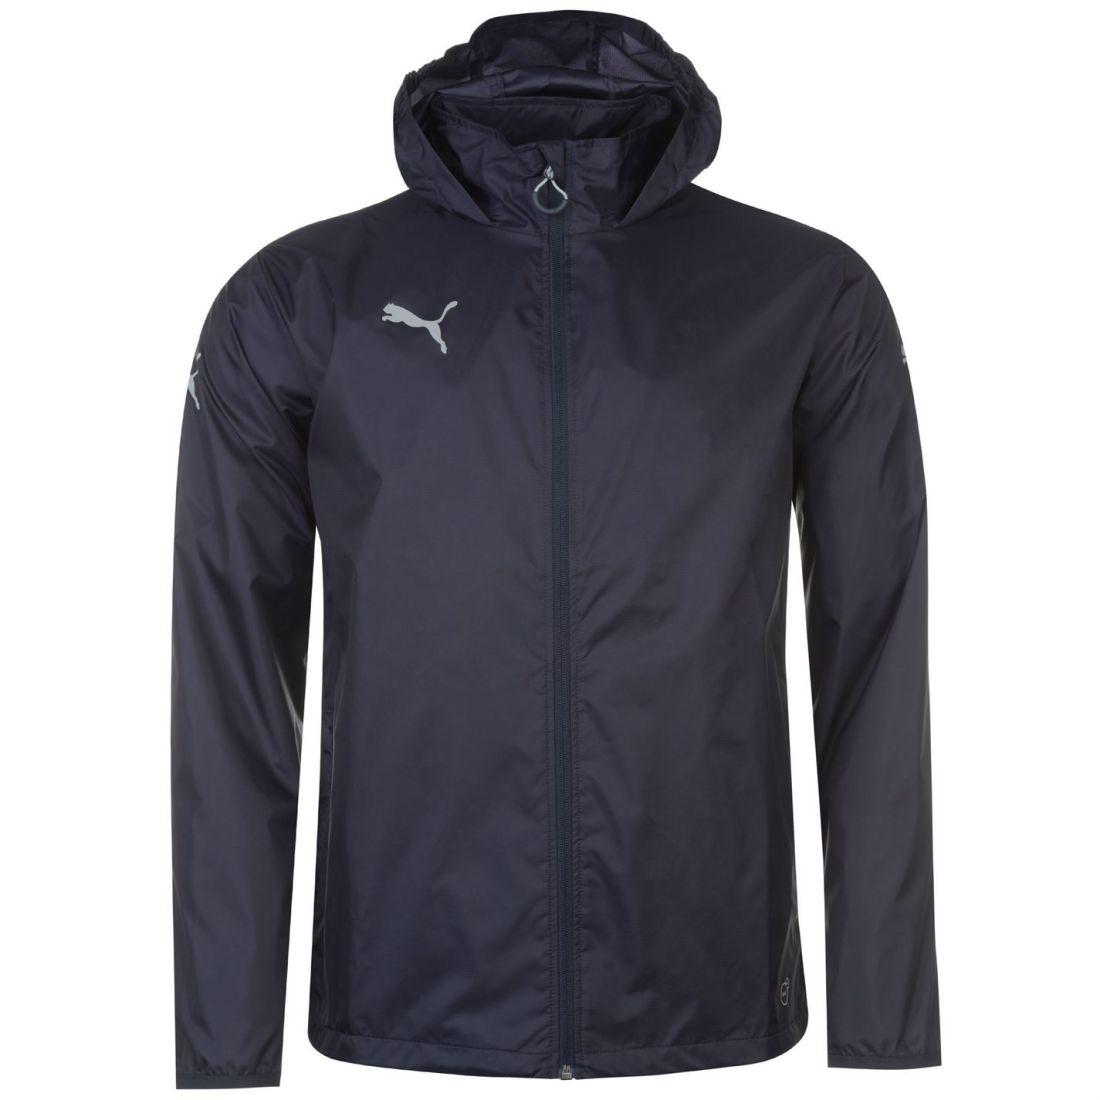 bea4f08ce952 Puma Mens Essential Rain Jacket Coat Top Breathable Hooded Zip Full ...